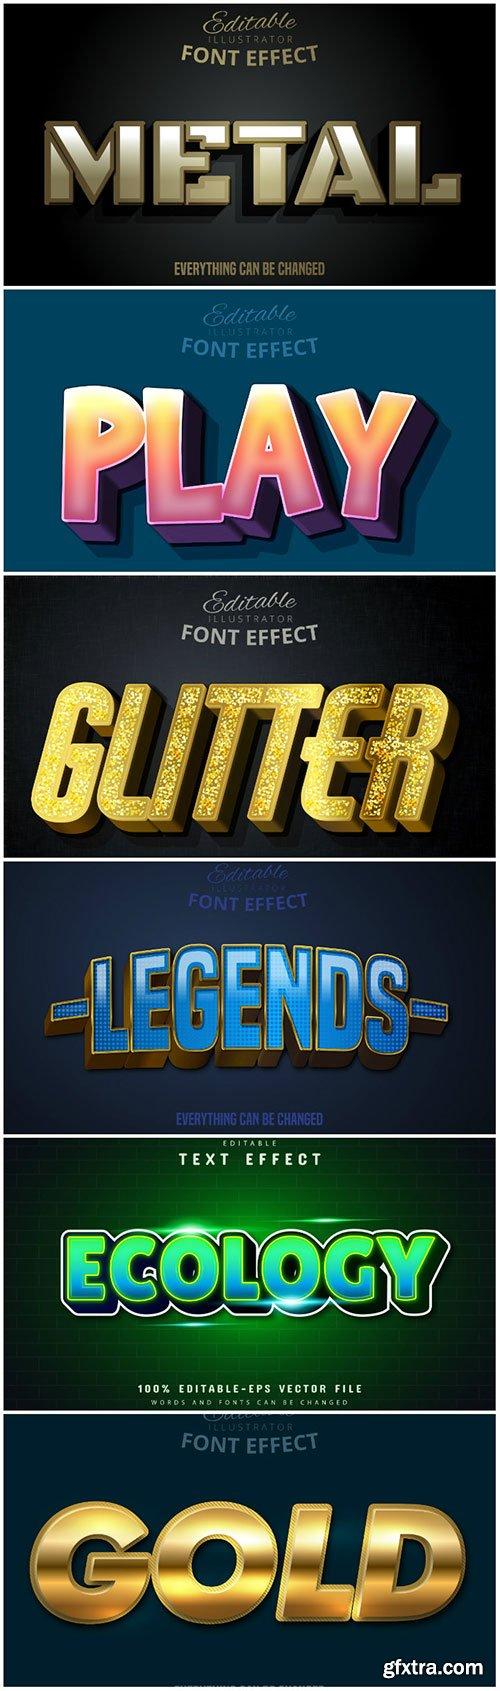 3d editable text style effect vector vol 161